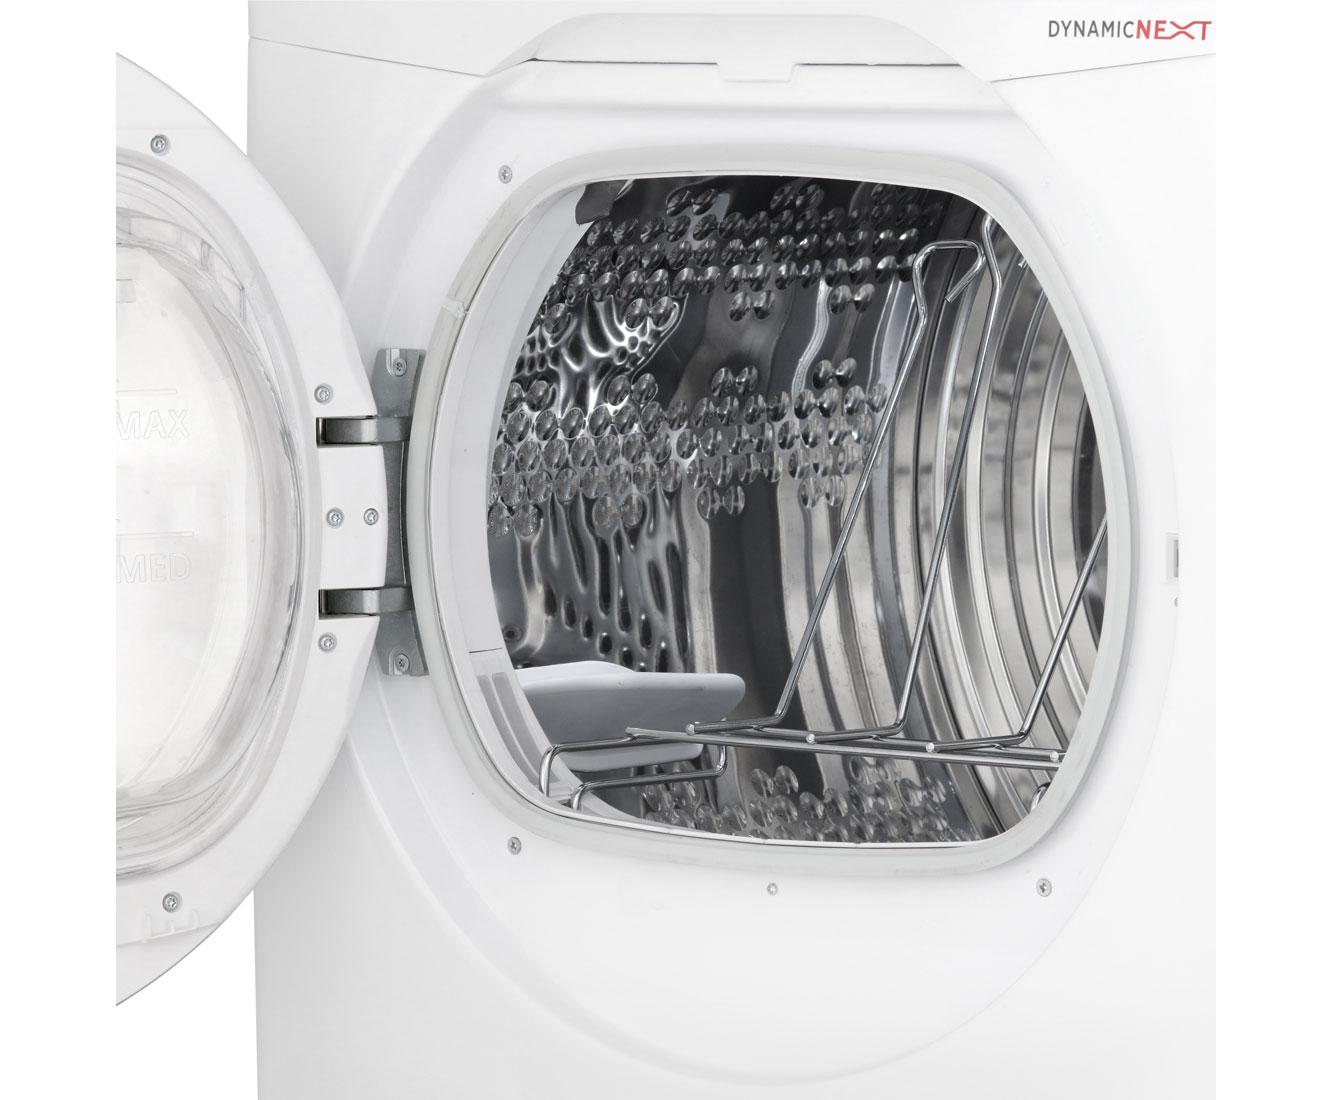 Hoover dx h10a2tcex s wärmepumpentrockner 10 kg weiß